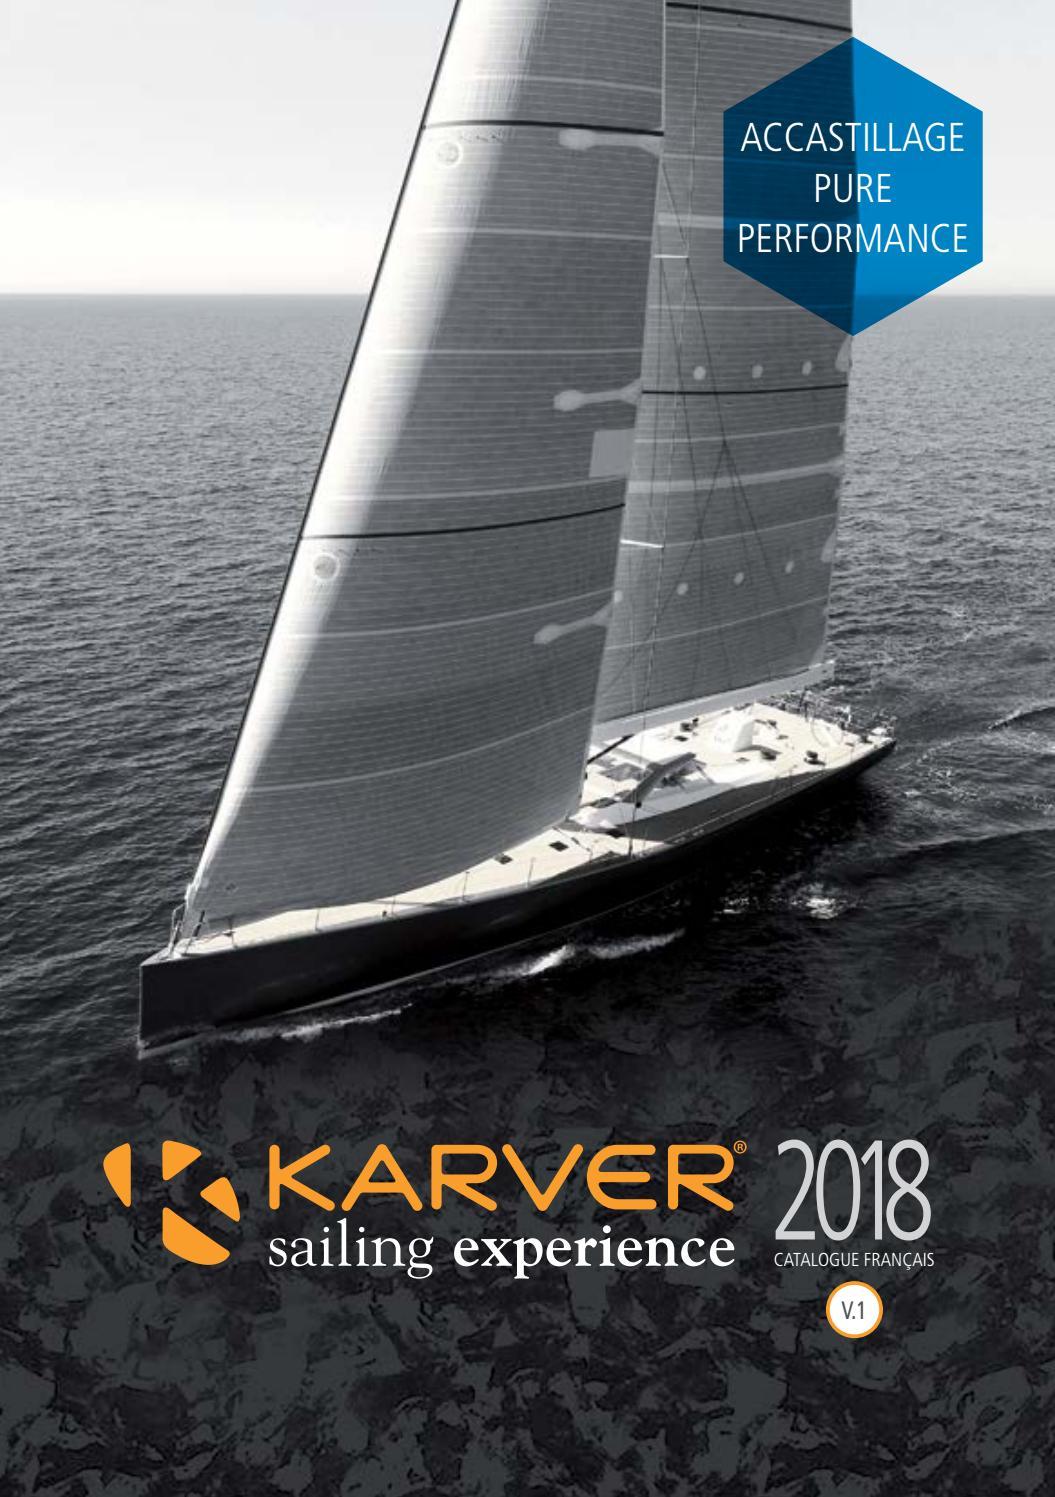 dégagement mode de luxe outlet Karver Catalogue 2018 (V1) Français by Karver Systems - issuu